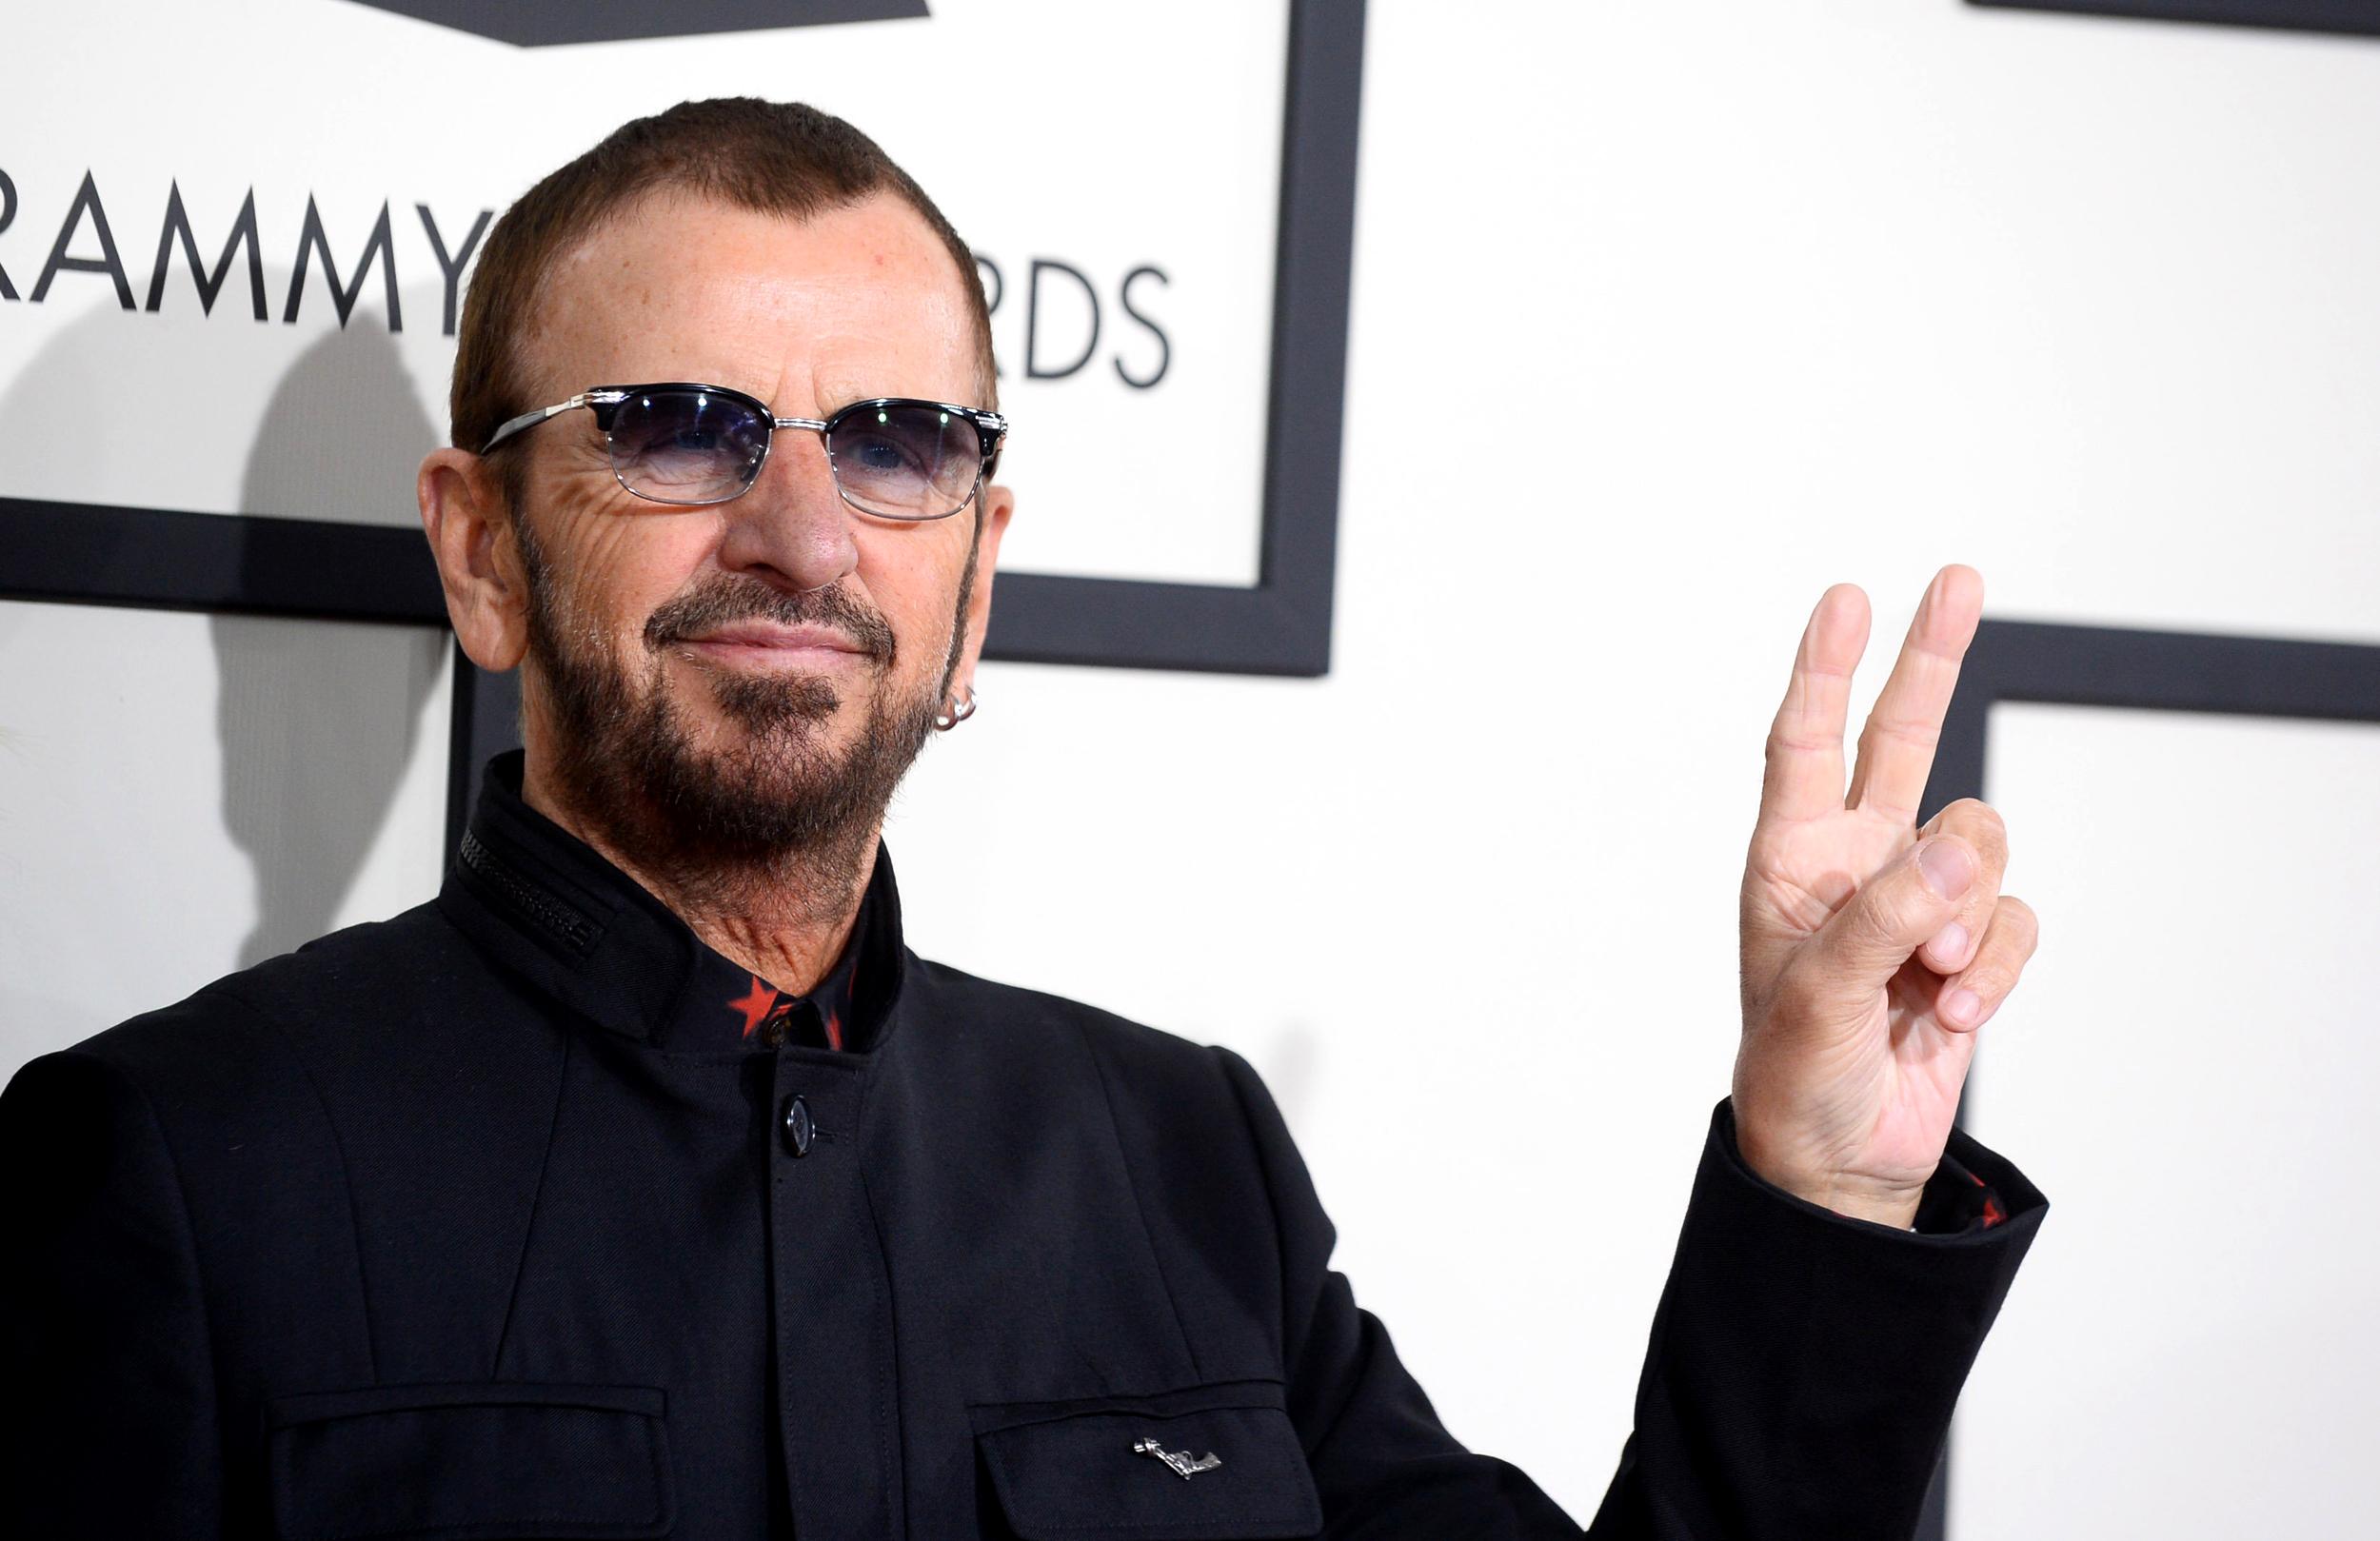 Ringo Ringo Deathstarr